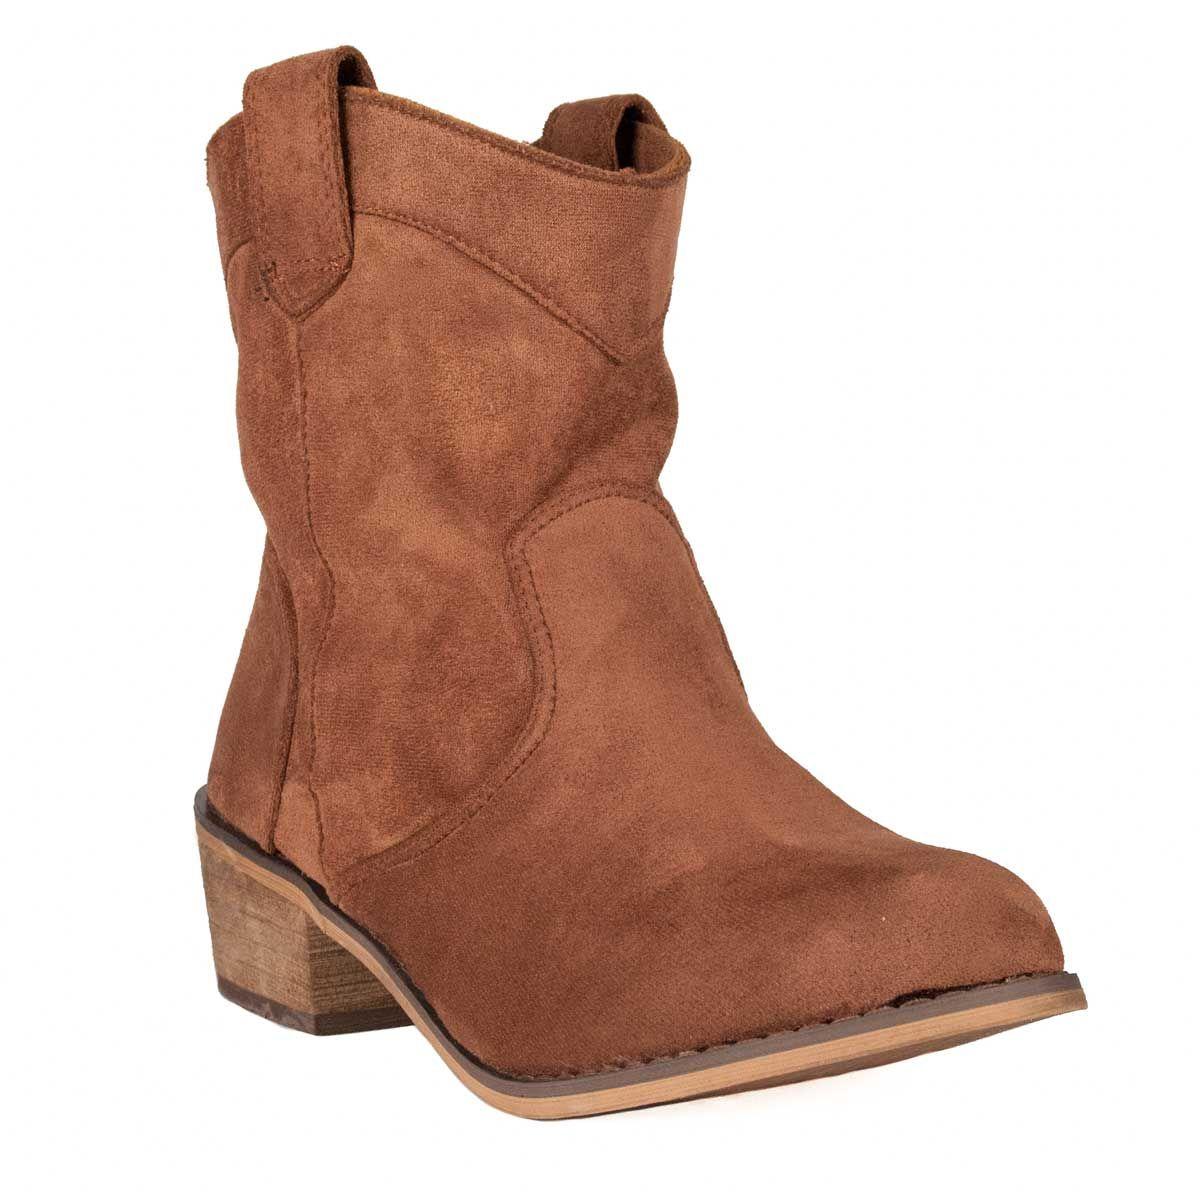 Montevita Flat Western Ankle Boot in Camel